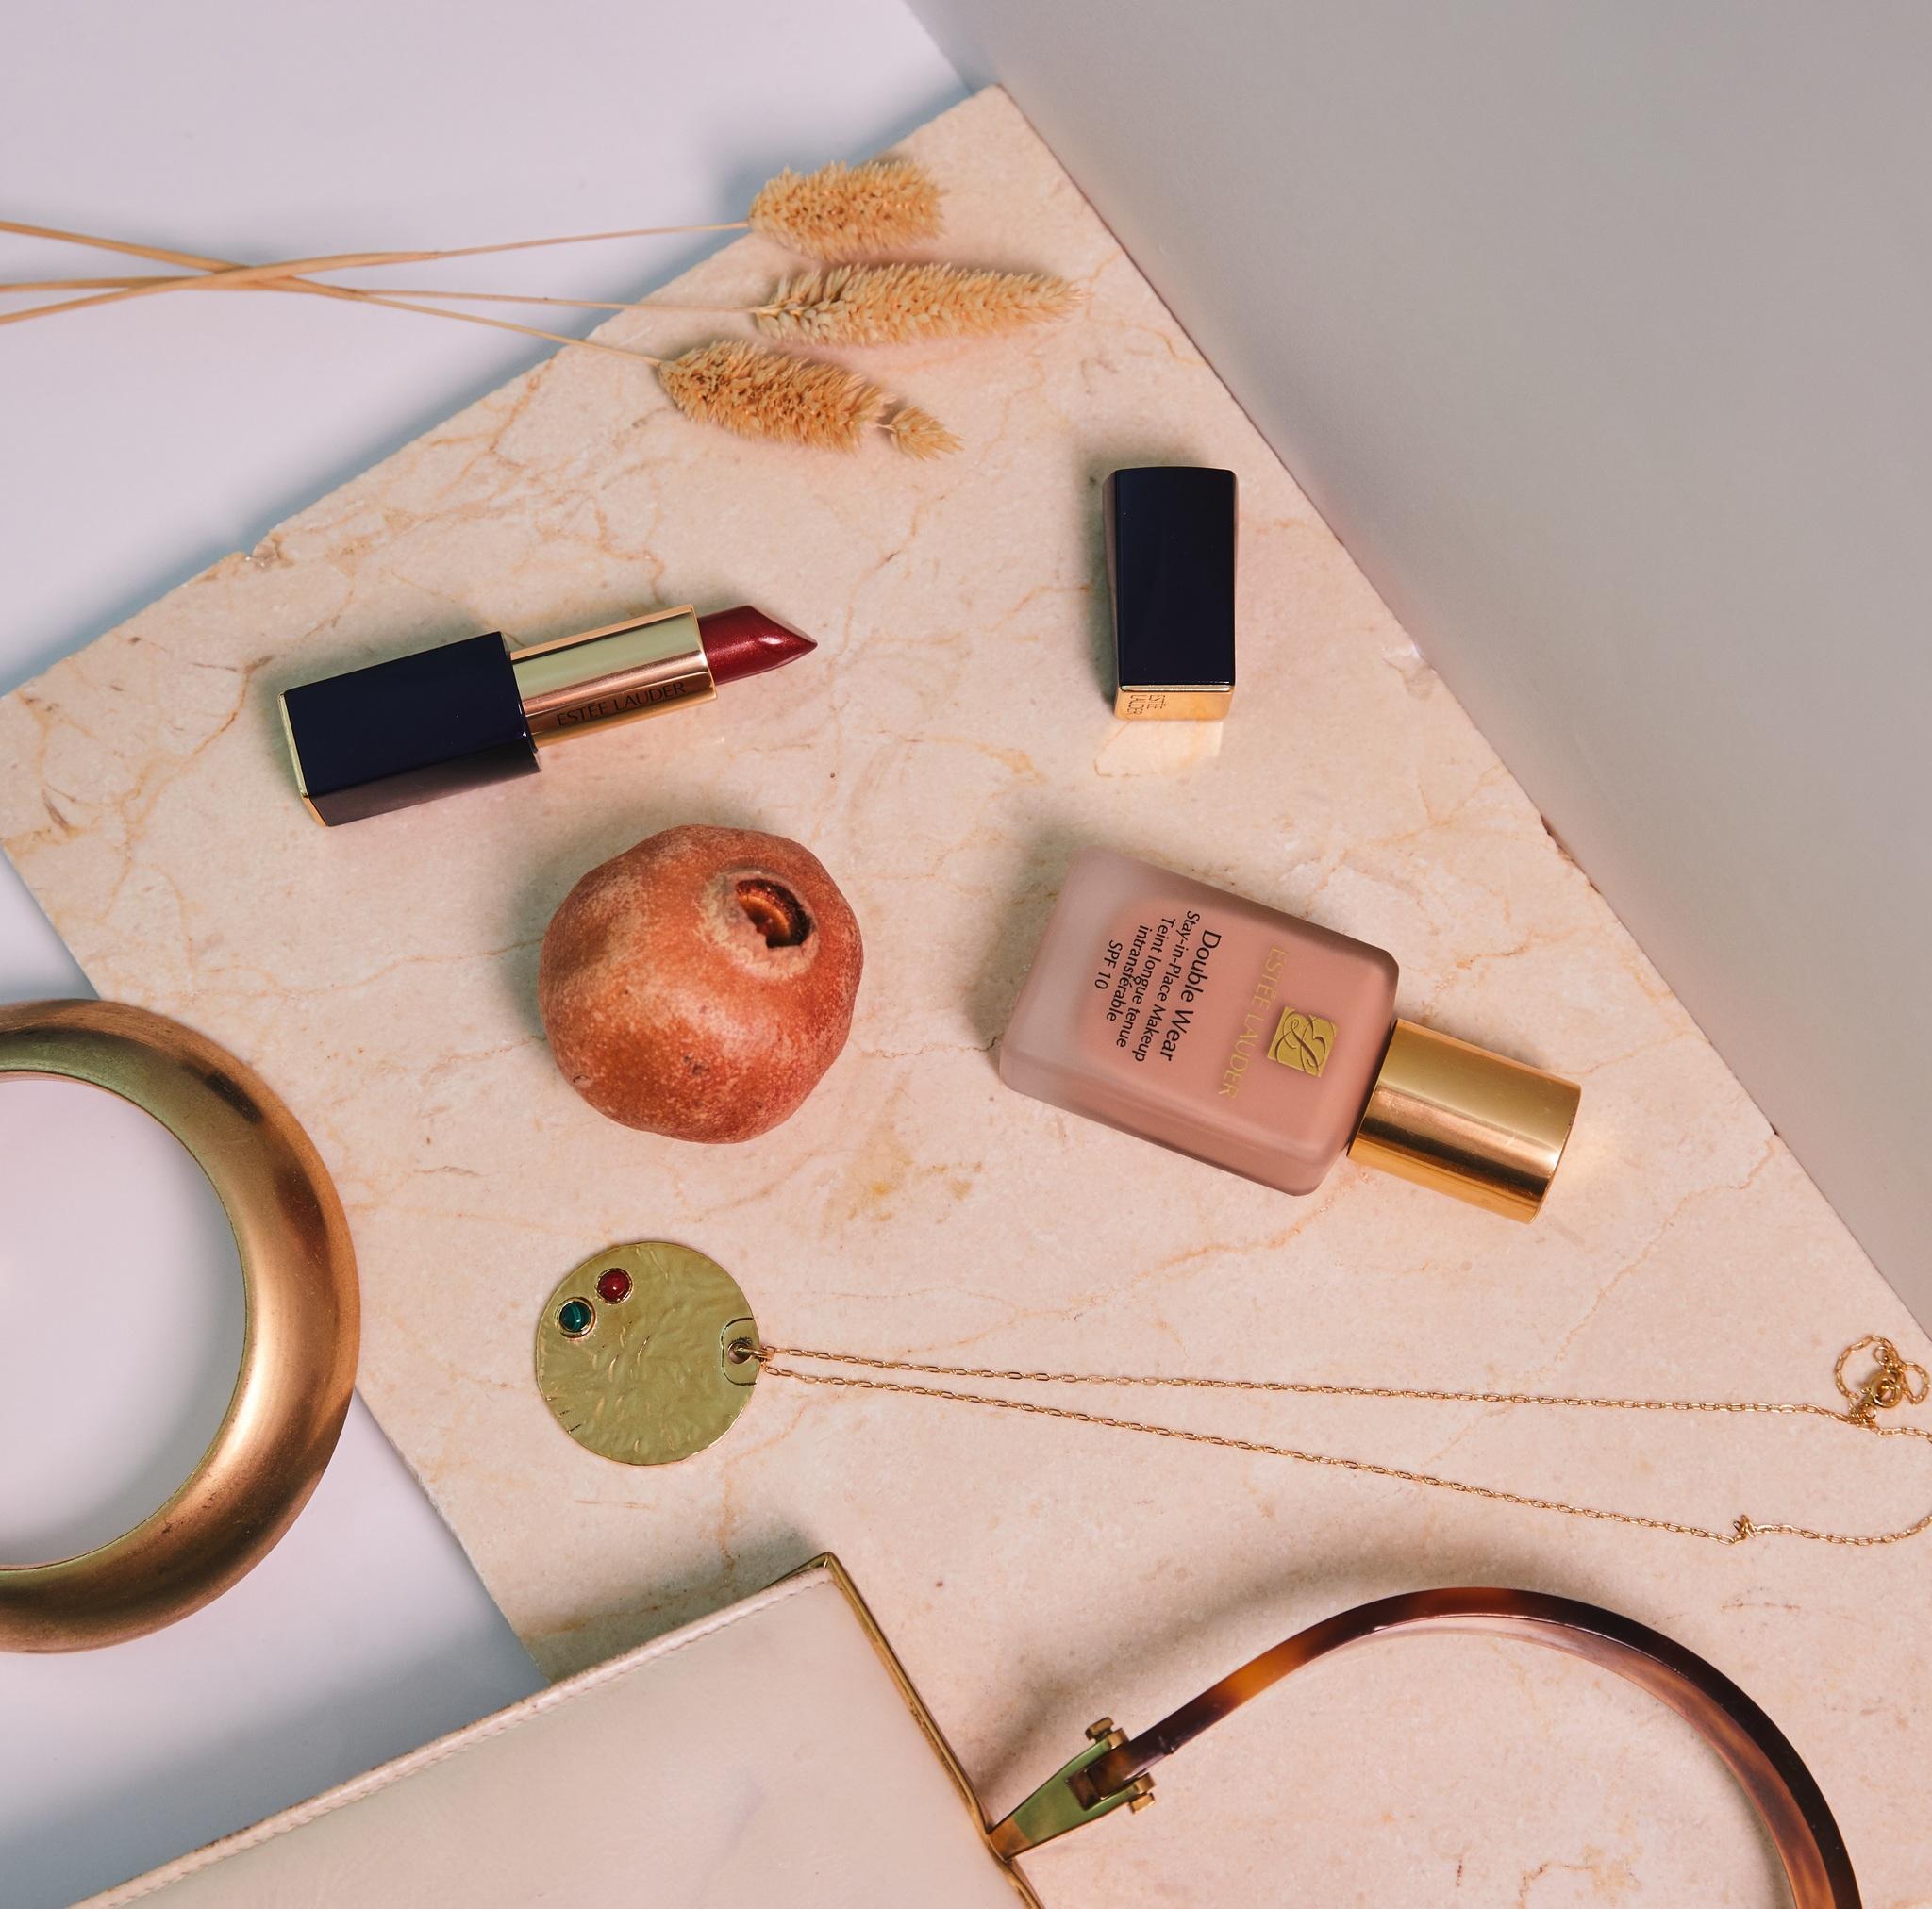 Productos de belleza de Estée Lauder.